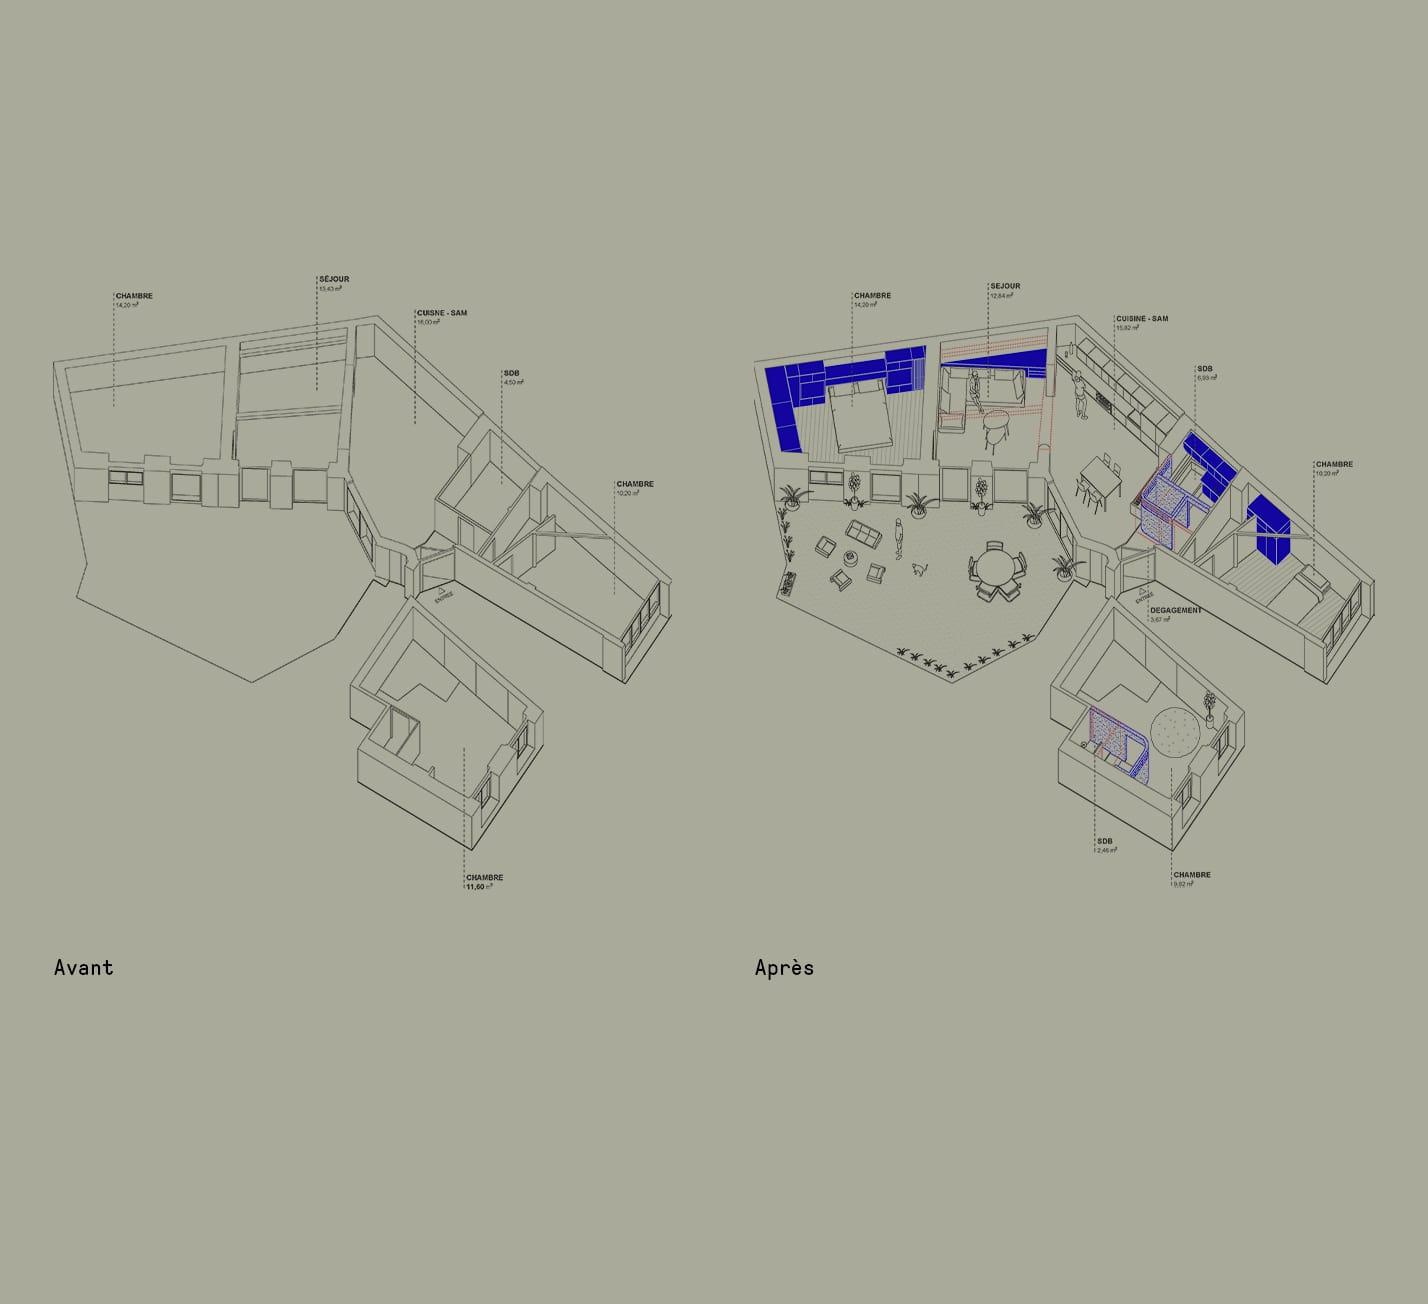 Appartement-Gobelins-Psd-dessins-03-min-1